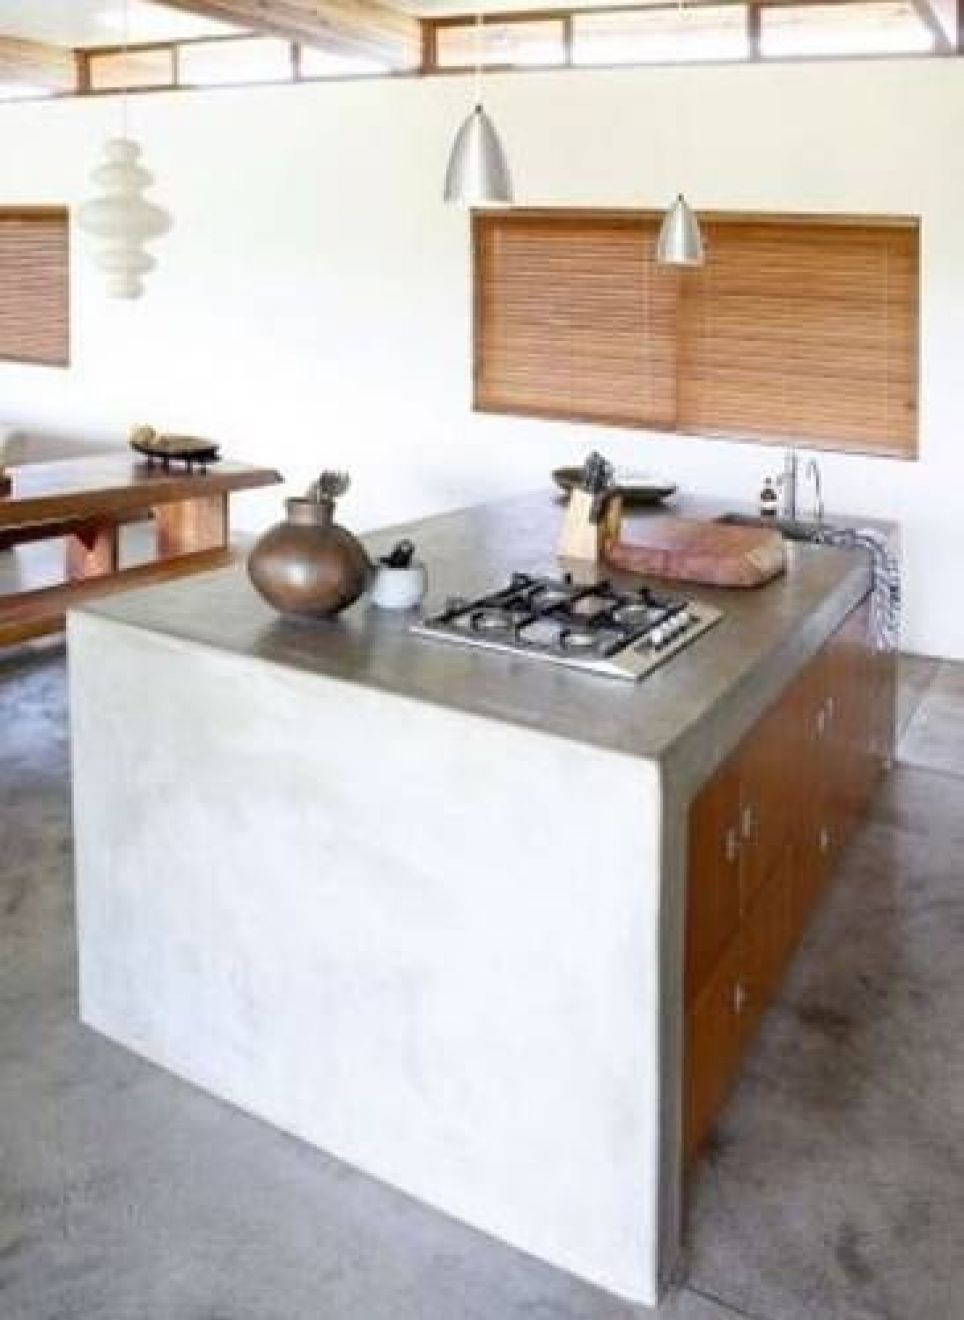 Ongoye View Residence, McCullum Street 25, 3867 Mtunzini